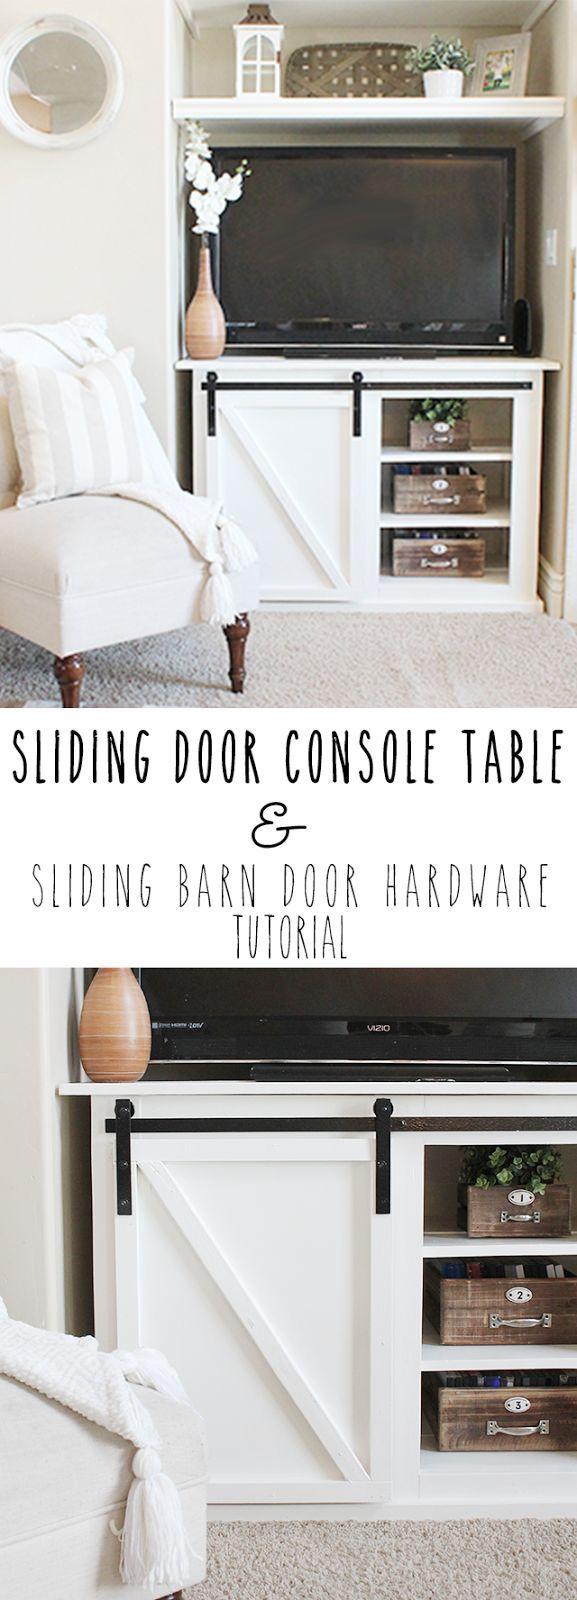 Diy Barn Doors Best 25 Diy Barn Door Hardware Ideas On Pinterest Sliding Barn